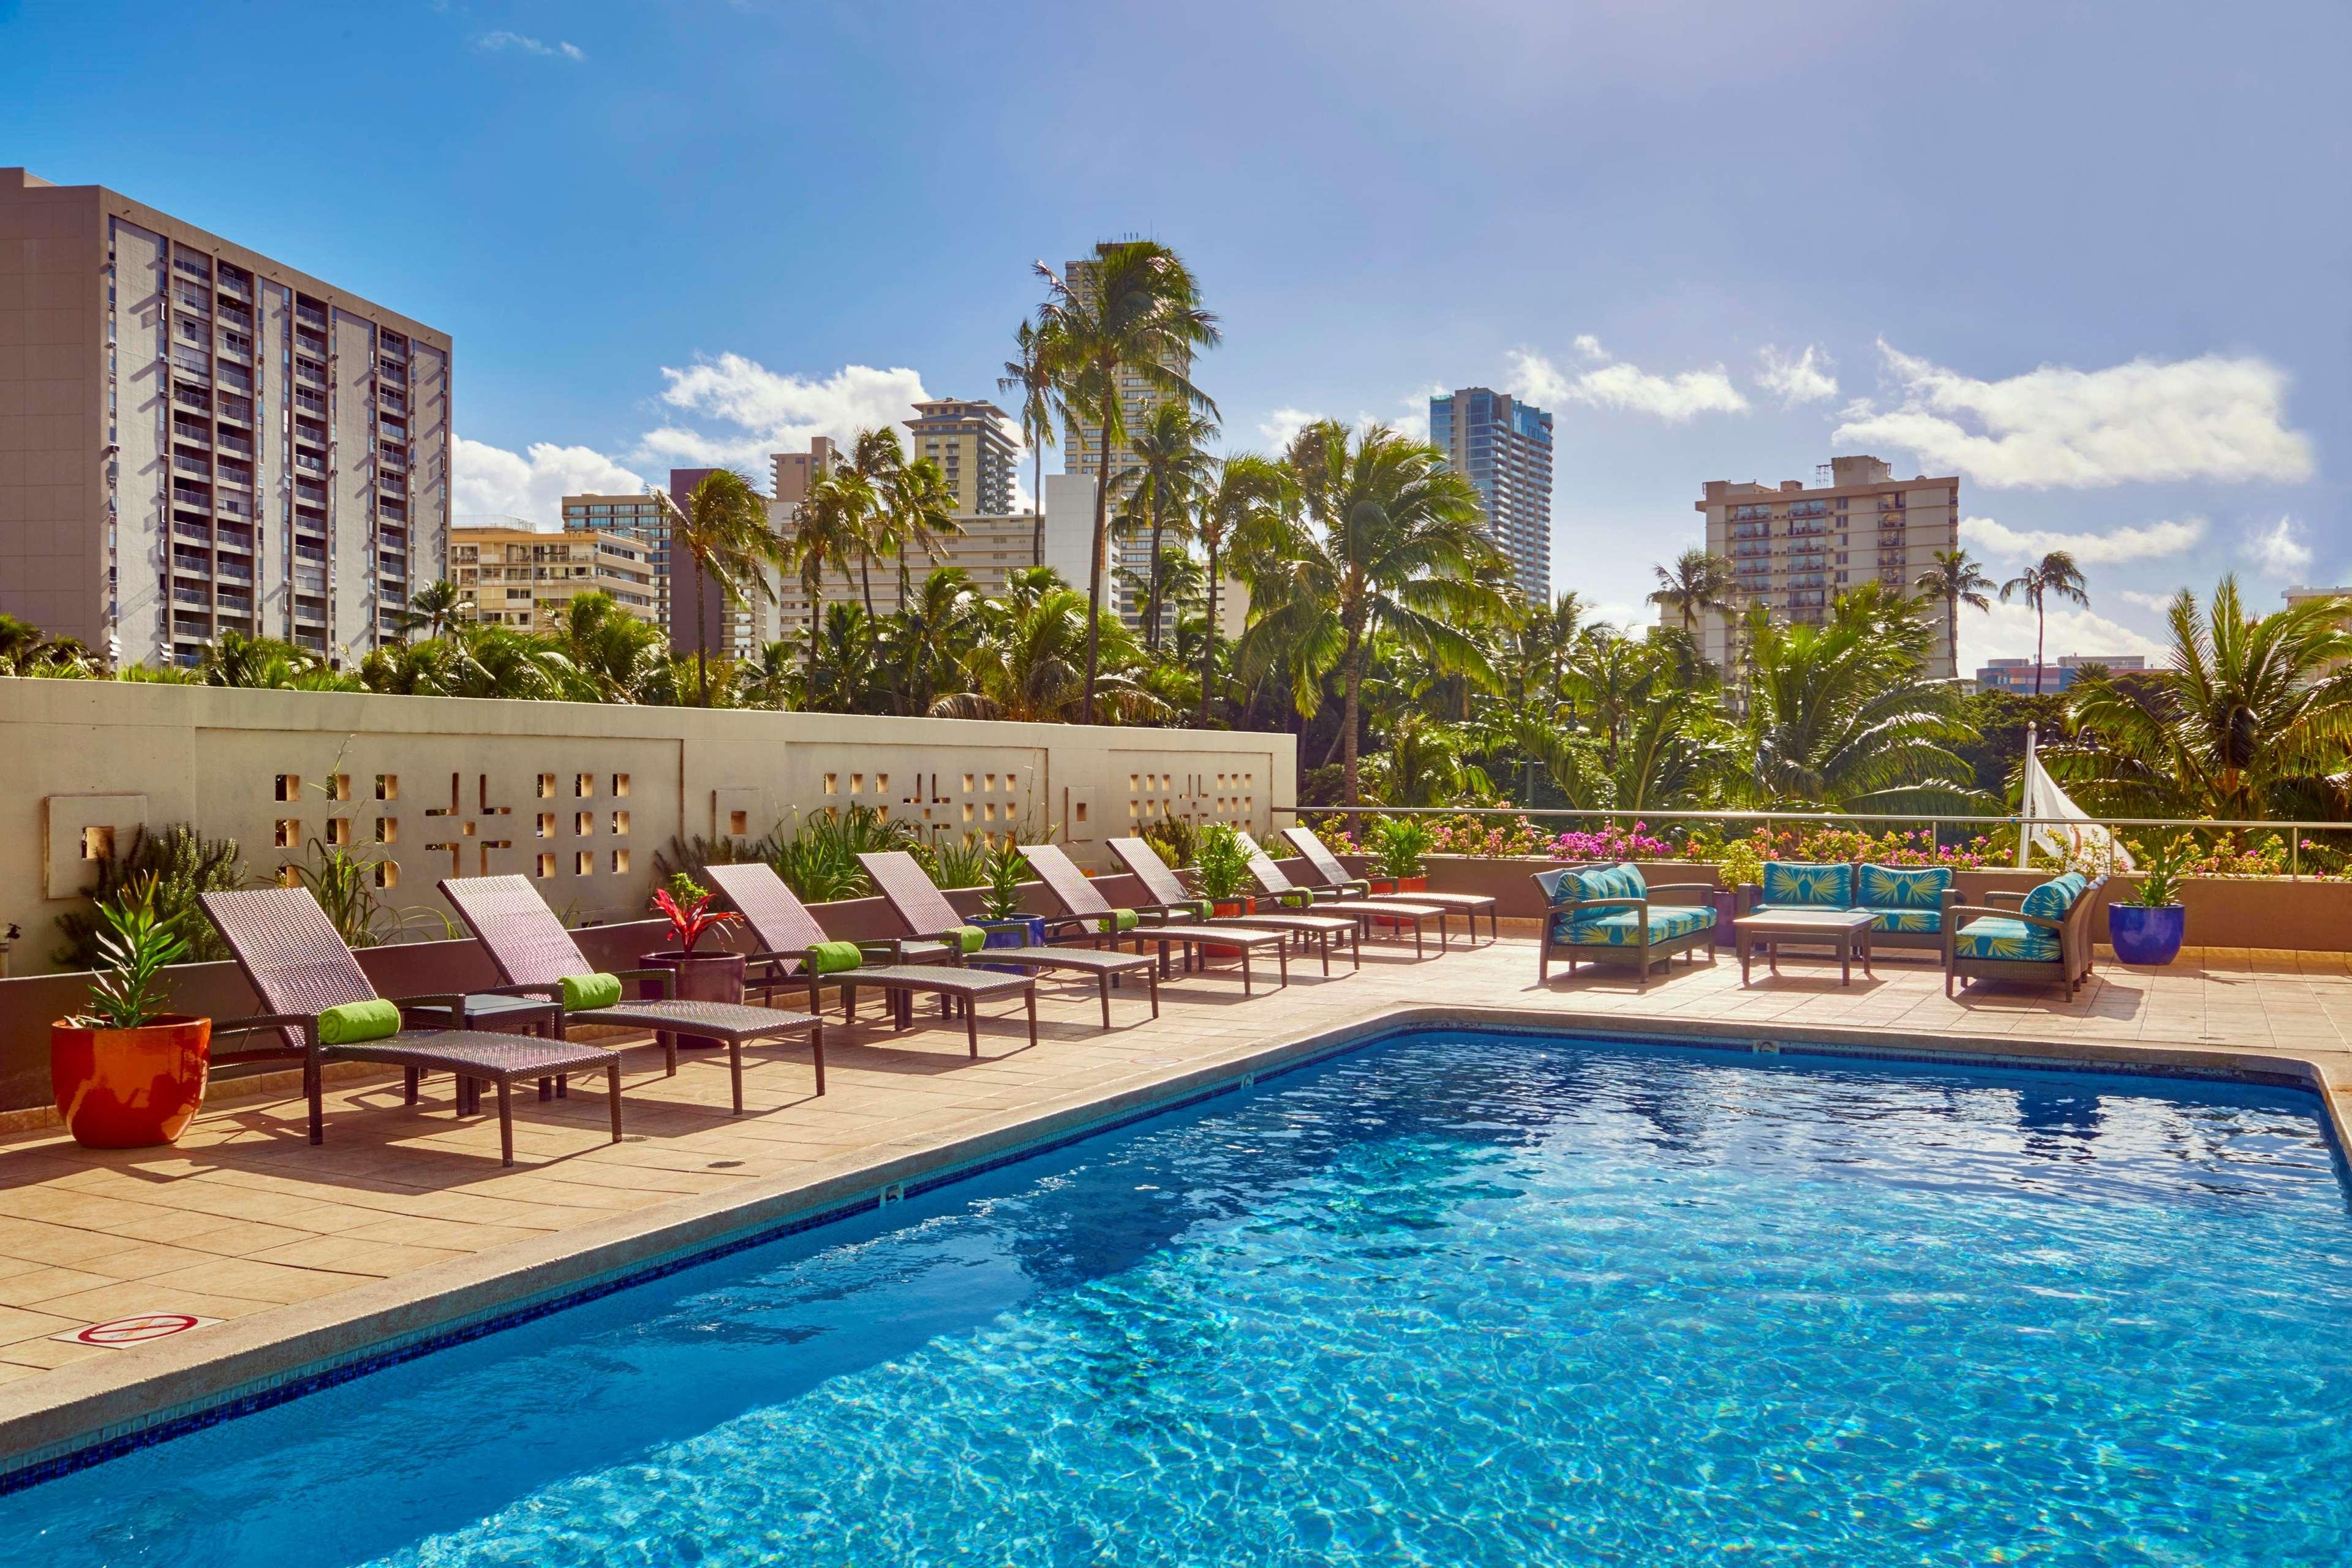 DoubleTree by Hilton Hotel Alana - Waikiki Beach image 22